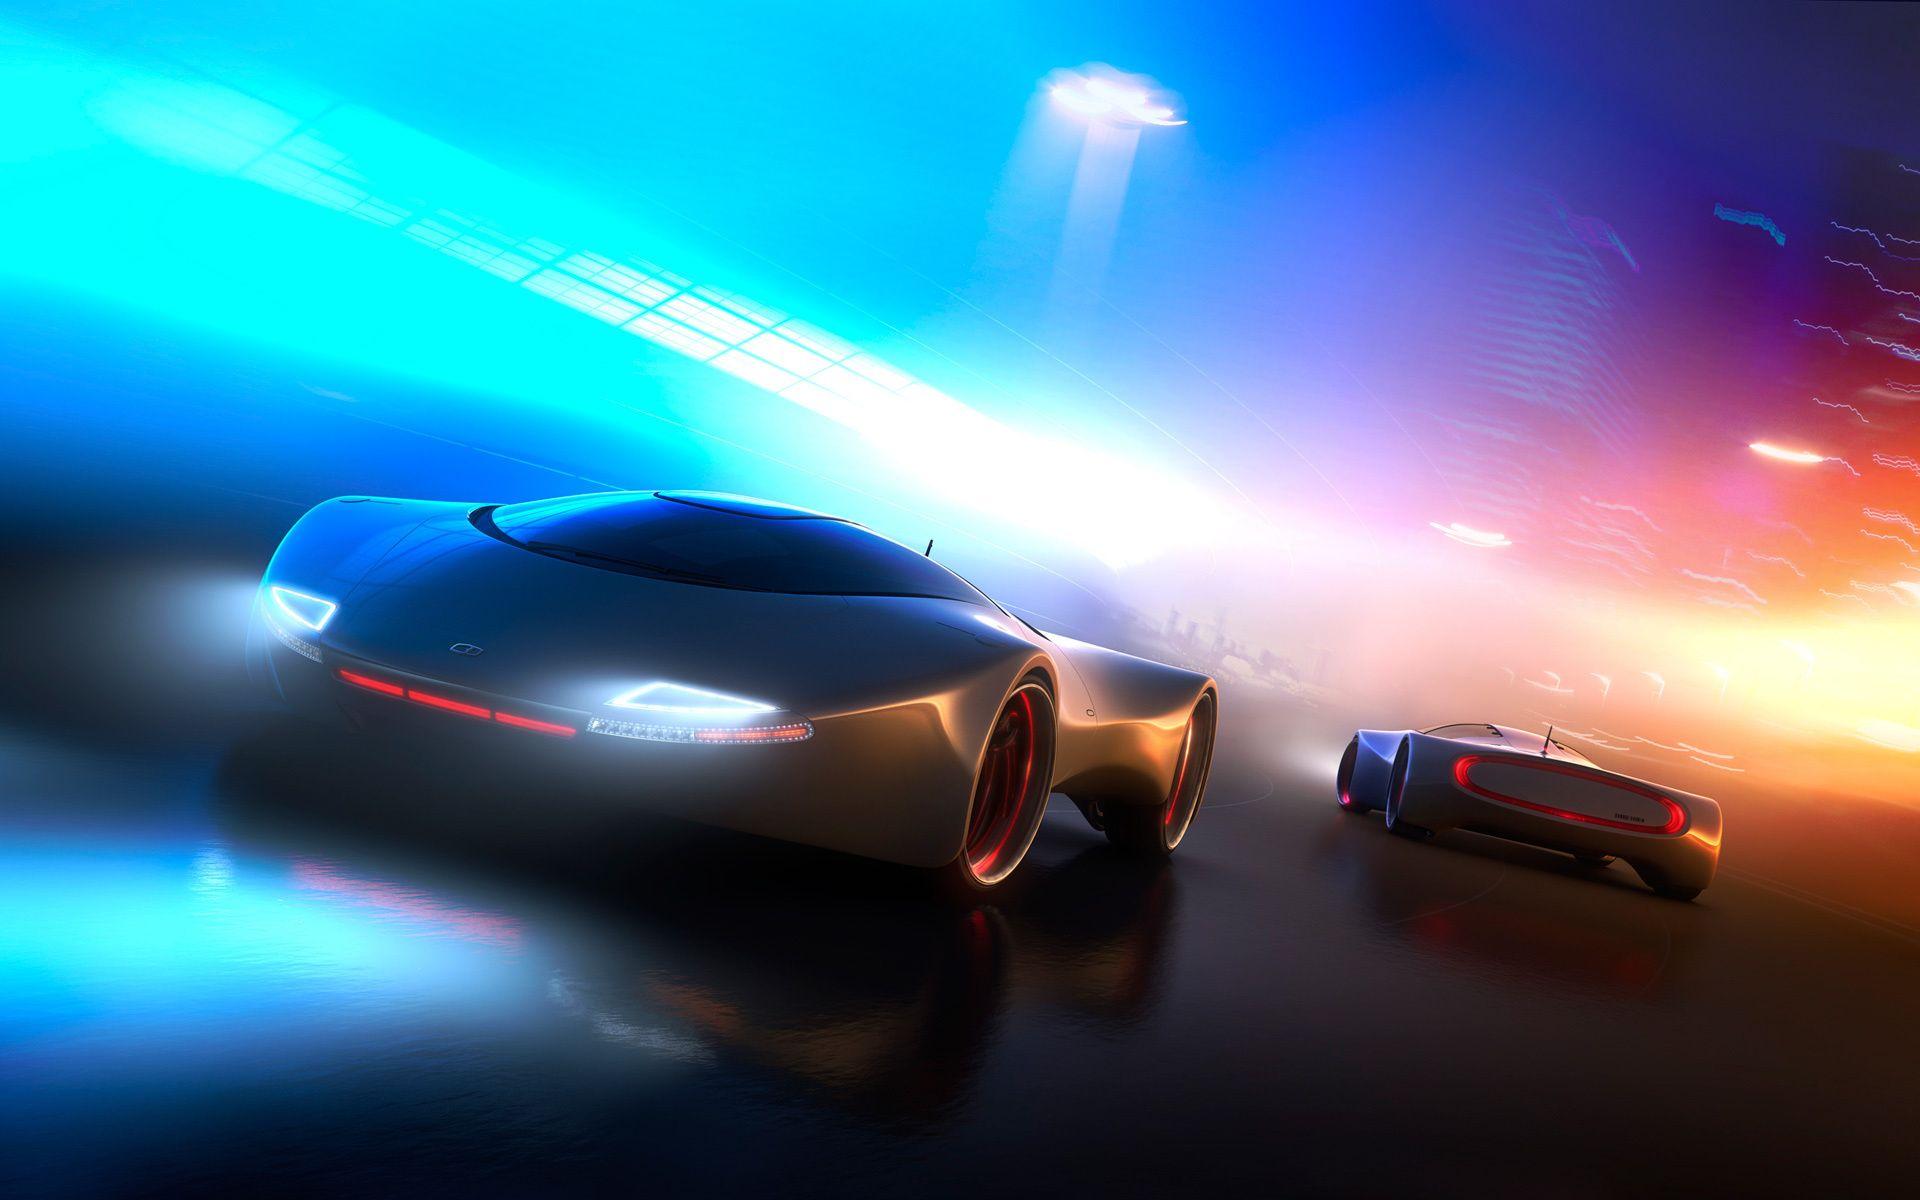 Futuristic Car Neon Light Concept Car Concept Cars Car Wallpapers Futuristic Cars